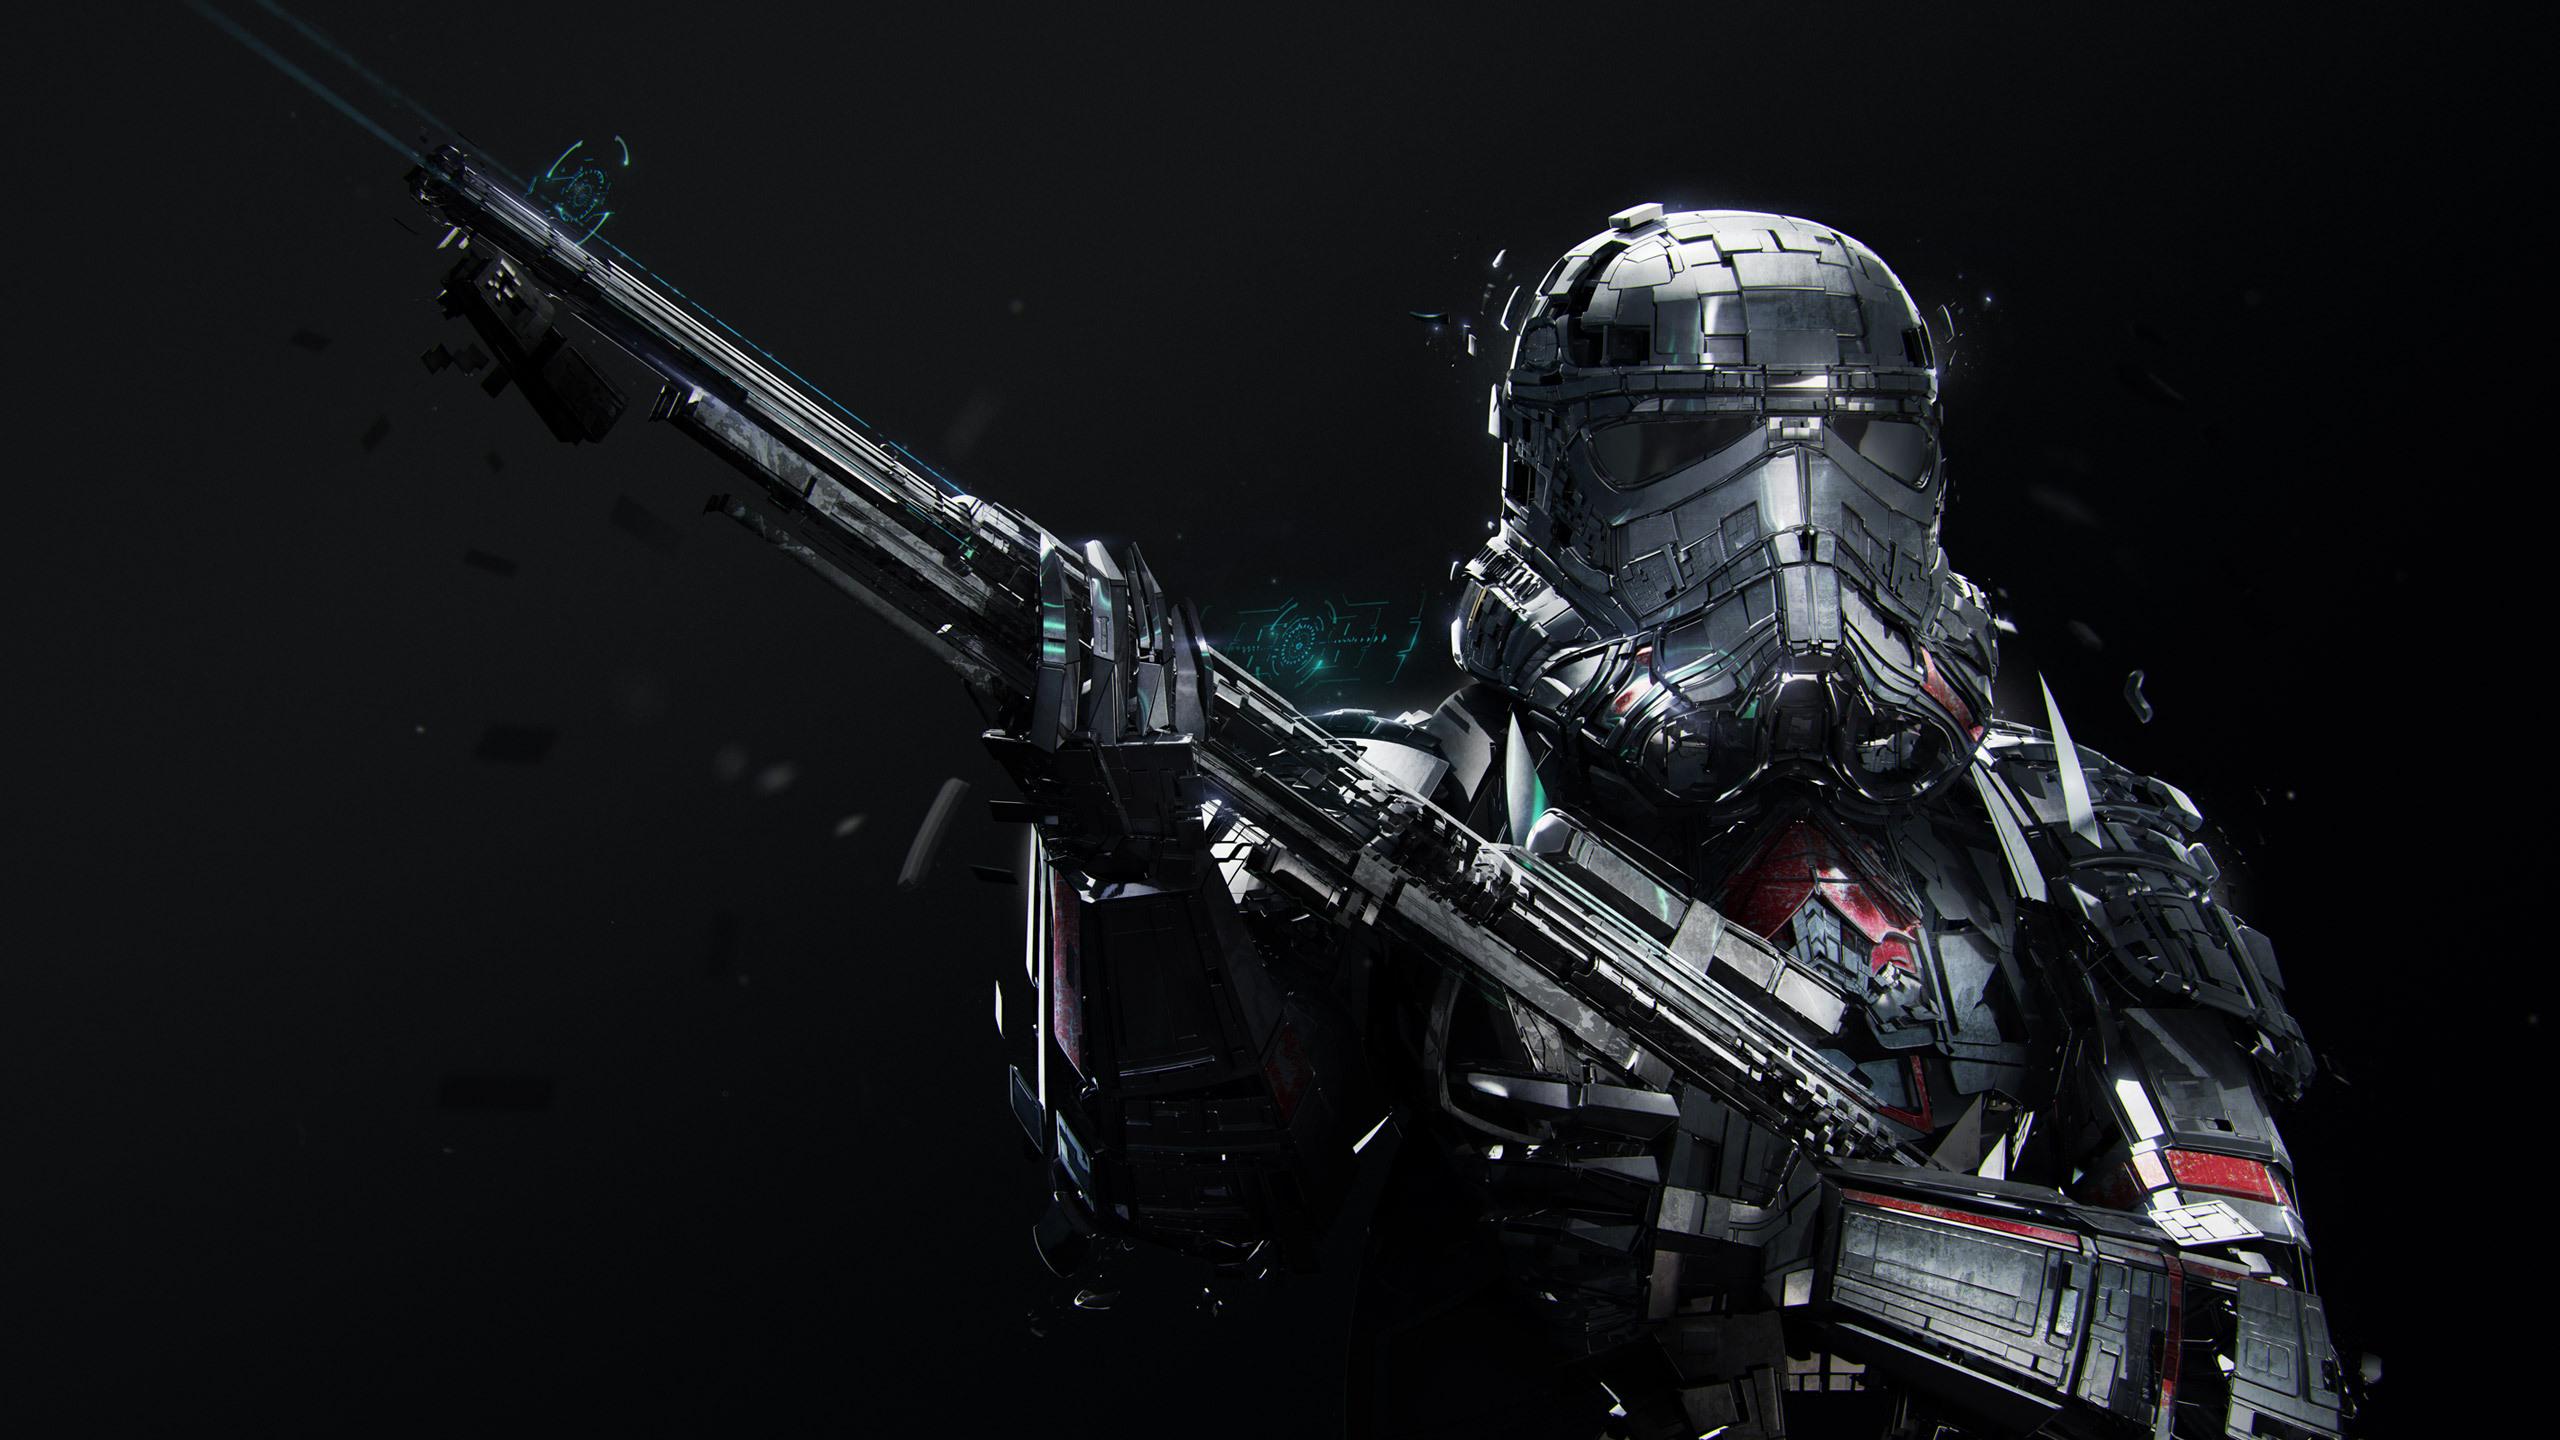 2560x1440 star wars stormtrooper 1440p resolution hd 4k wallpapers